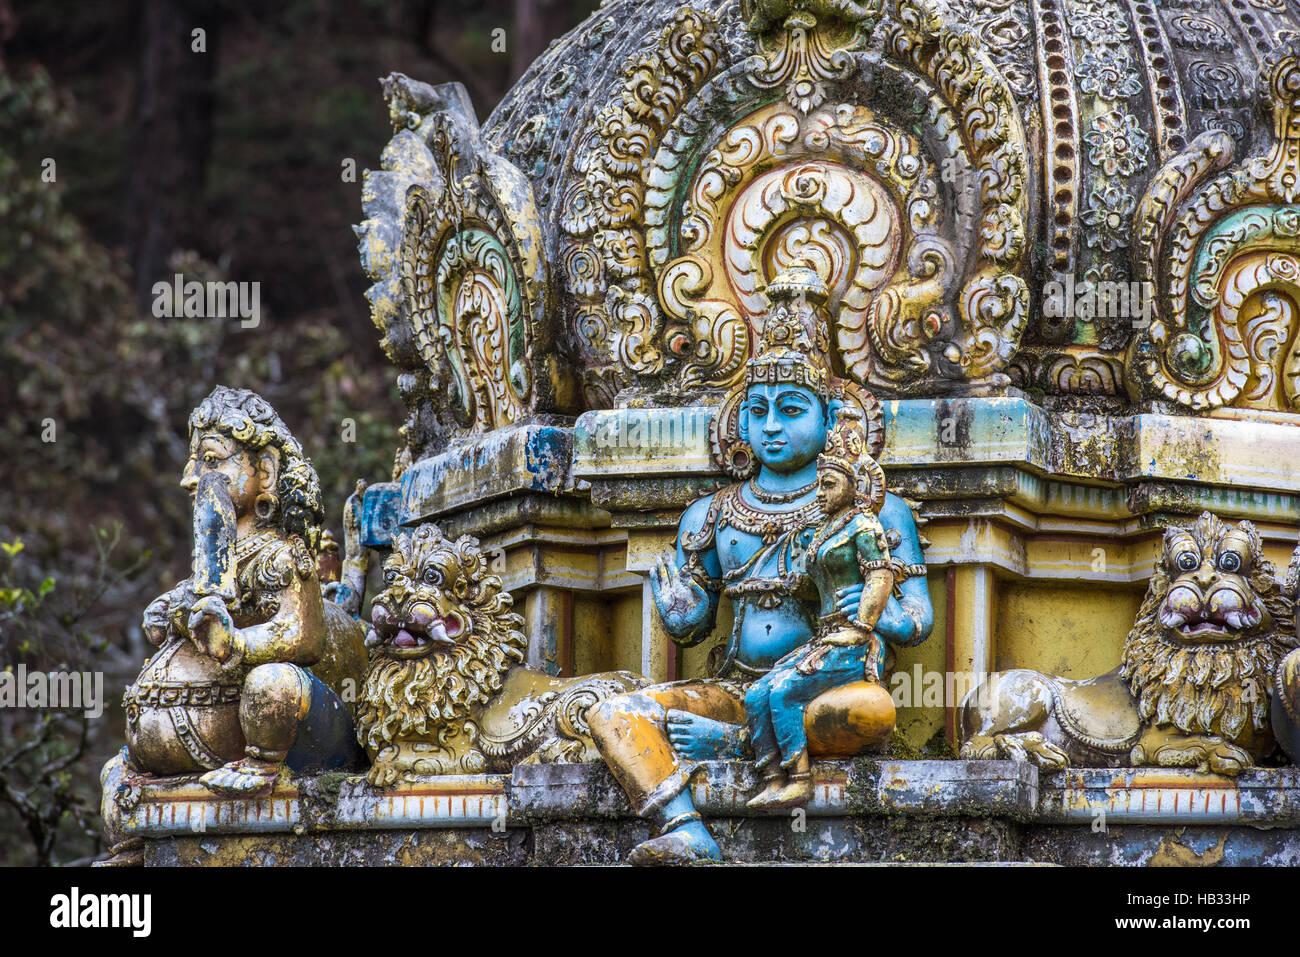 Seetha Amman Hindu temple, Sri Lanka - Stock Image